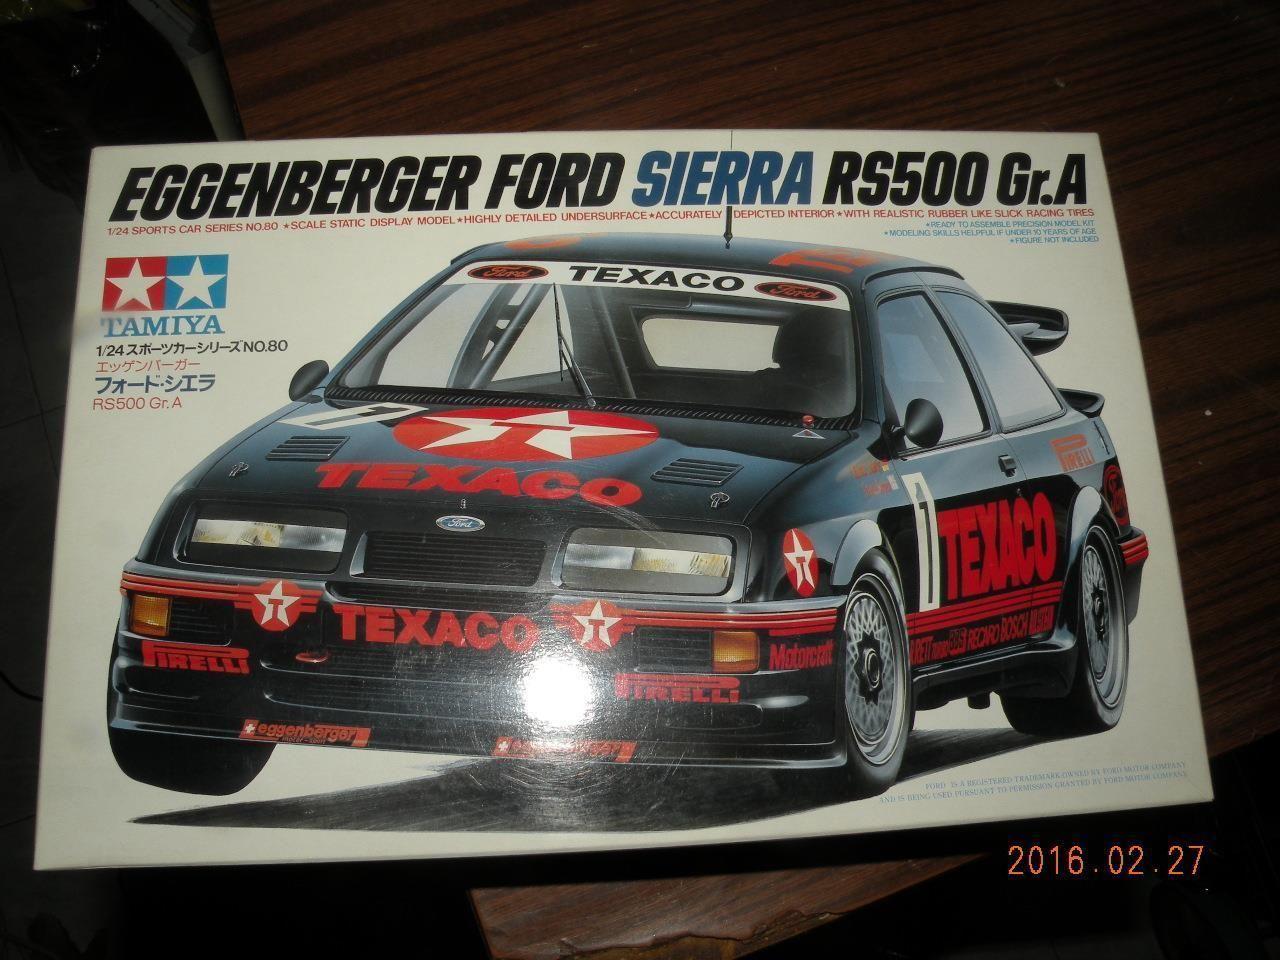 Tamiya 1 24 Eggenberger Ford Sierra Rs500 Gr A Kit Texaco 24080